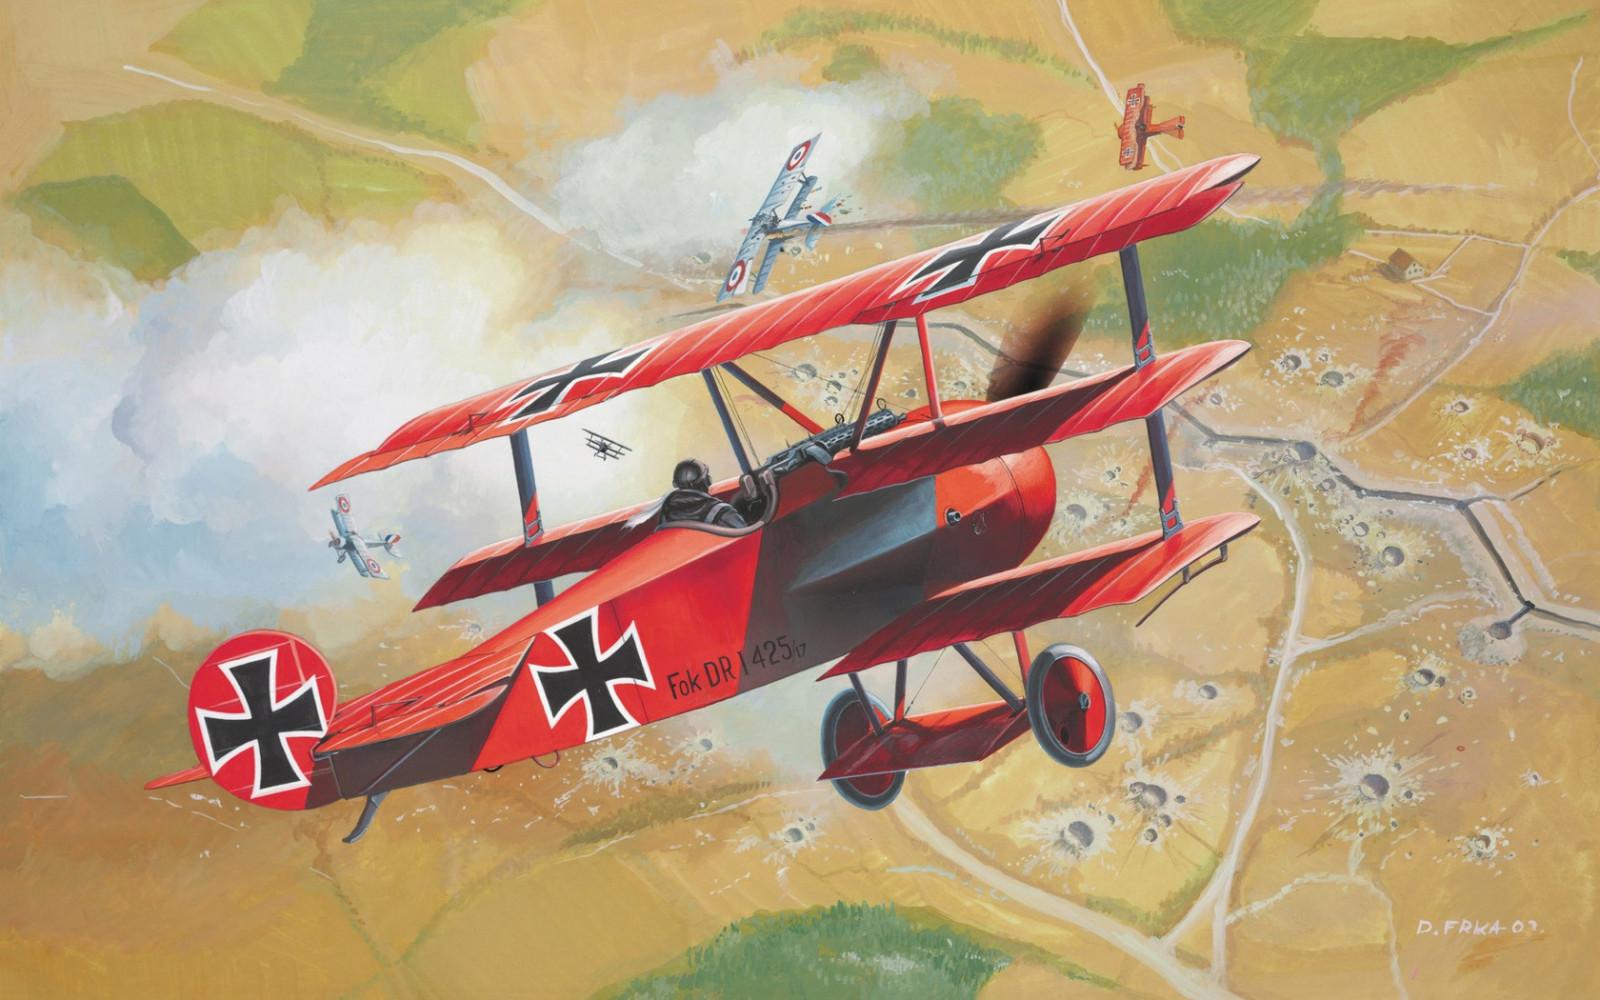 illustration véhicule ouvrages d'art avion avion biplan Tranchées Baron Rouge Luftwaffe Fokker DR 1 Vol aviation aile Atmosphère de la terre